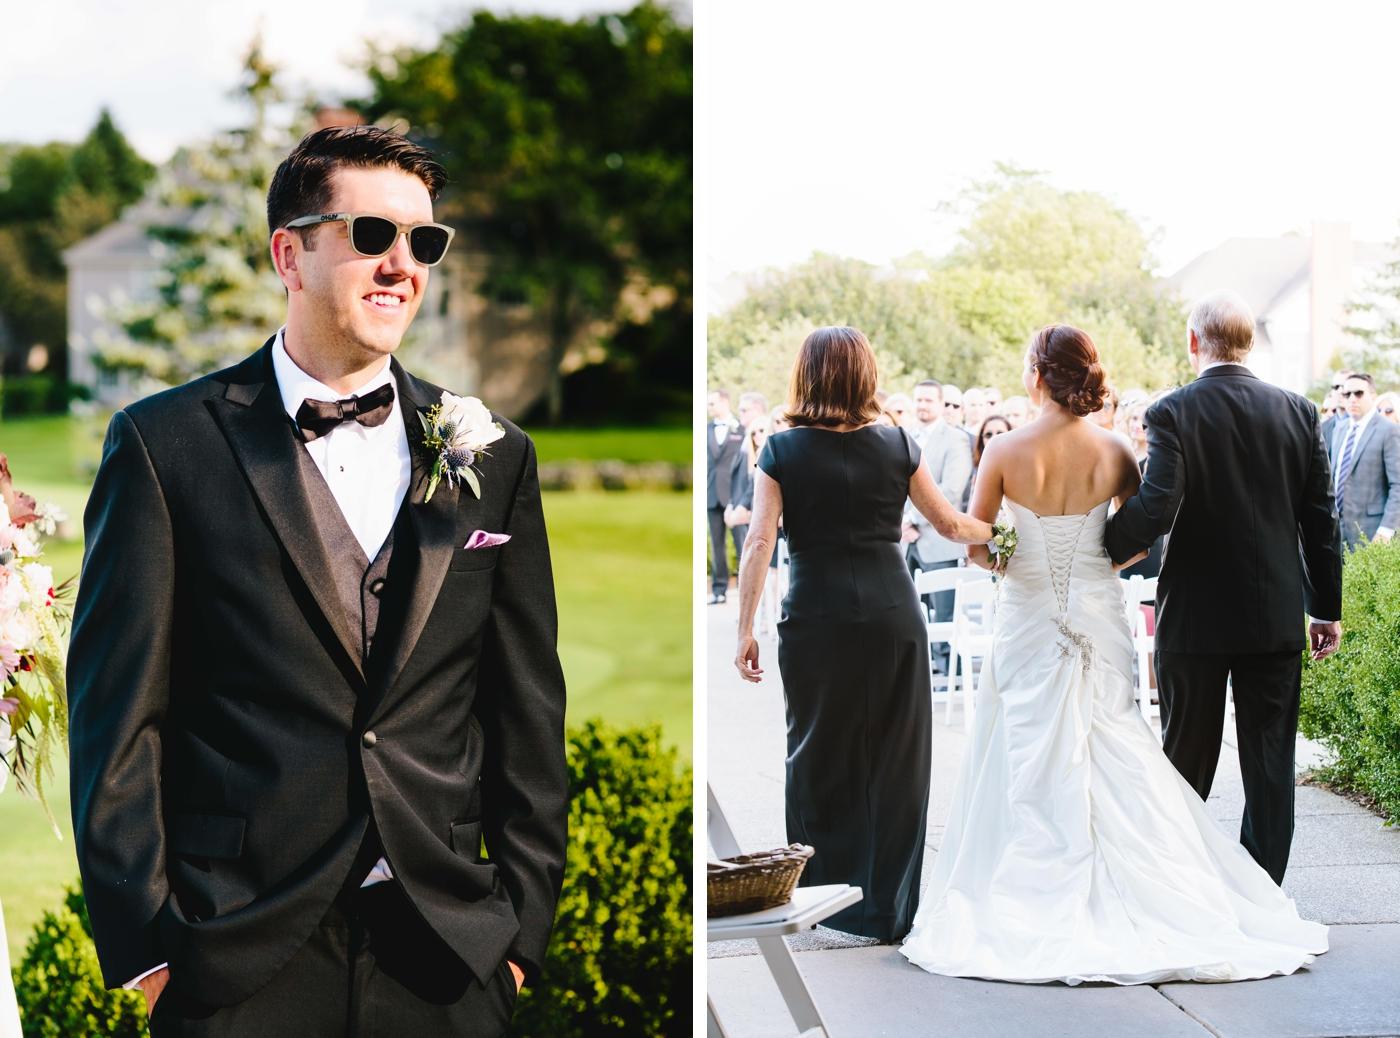 chicago-fine-art-wedding-photography-friel15